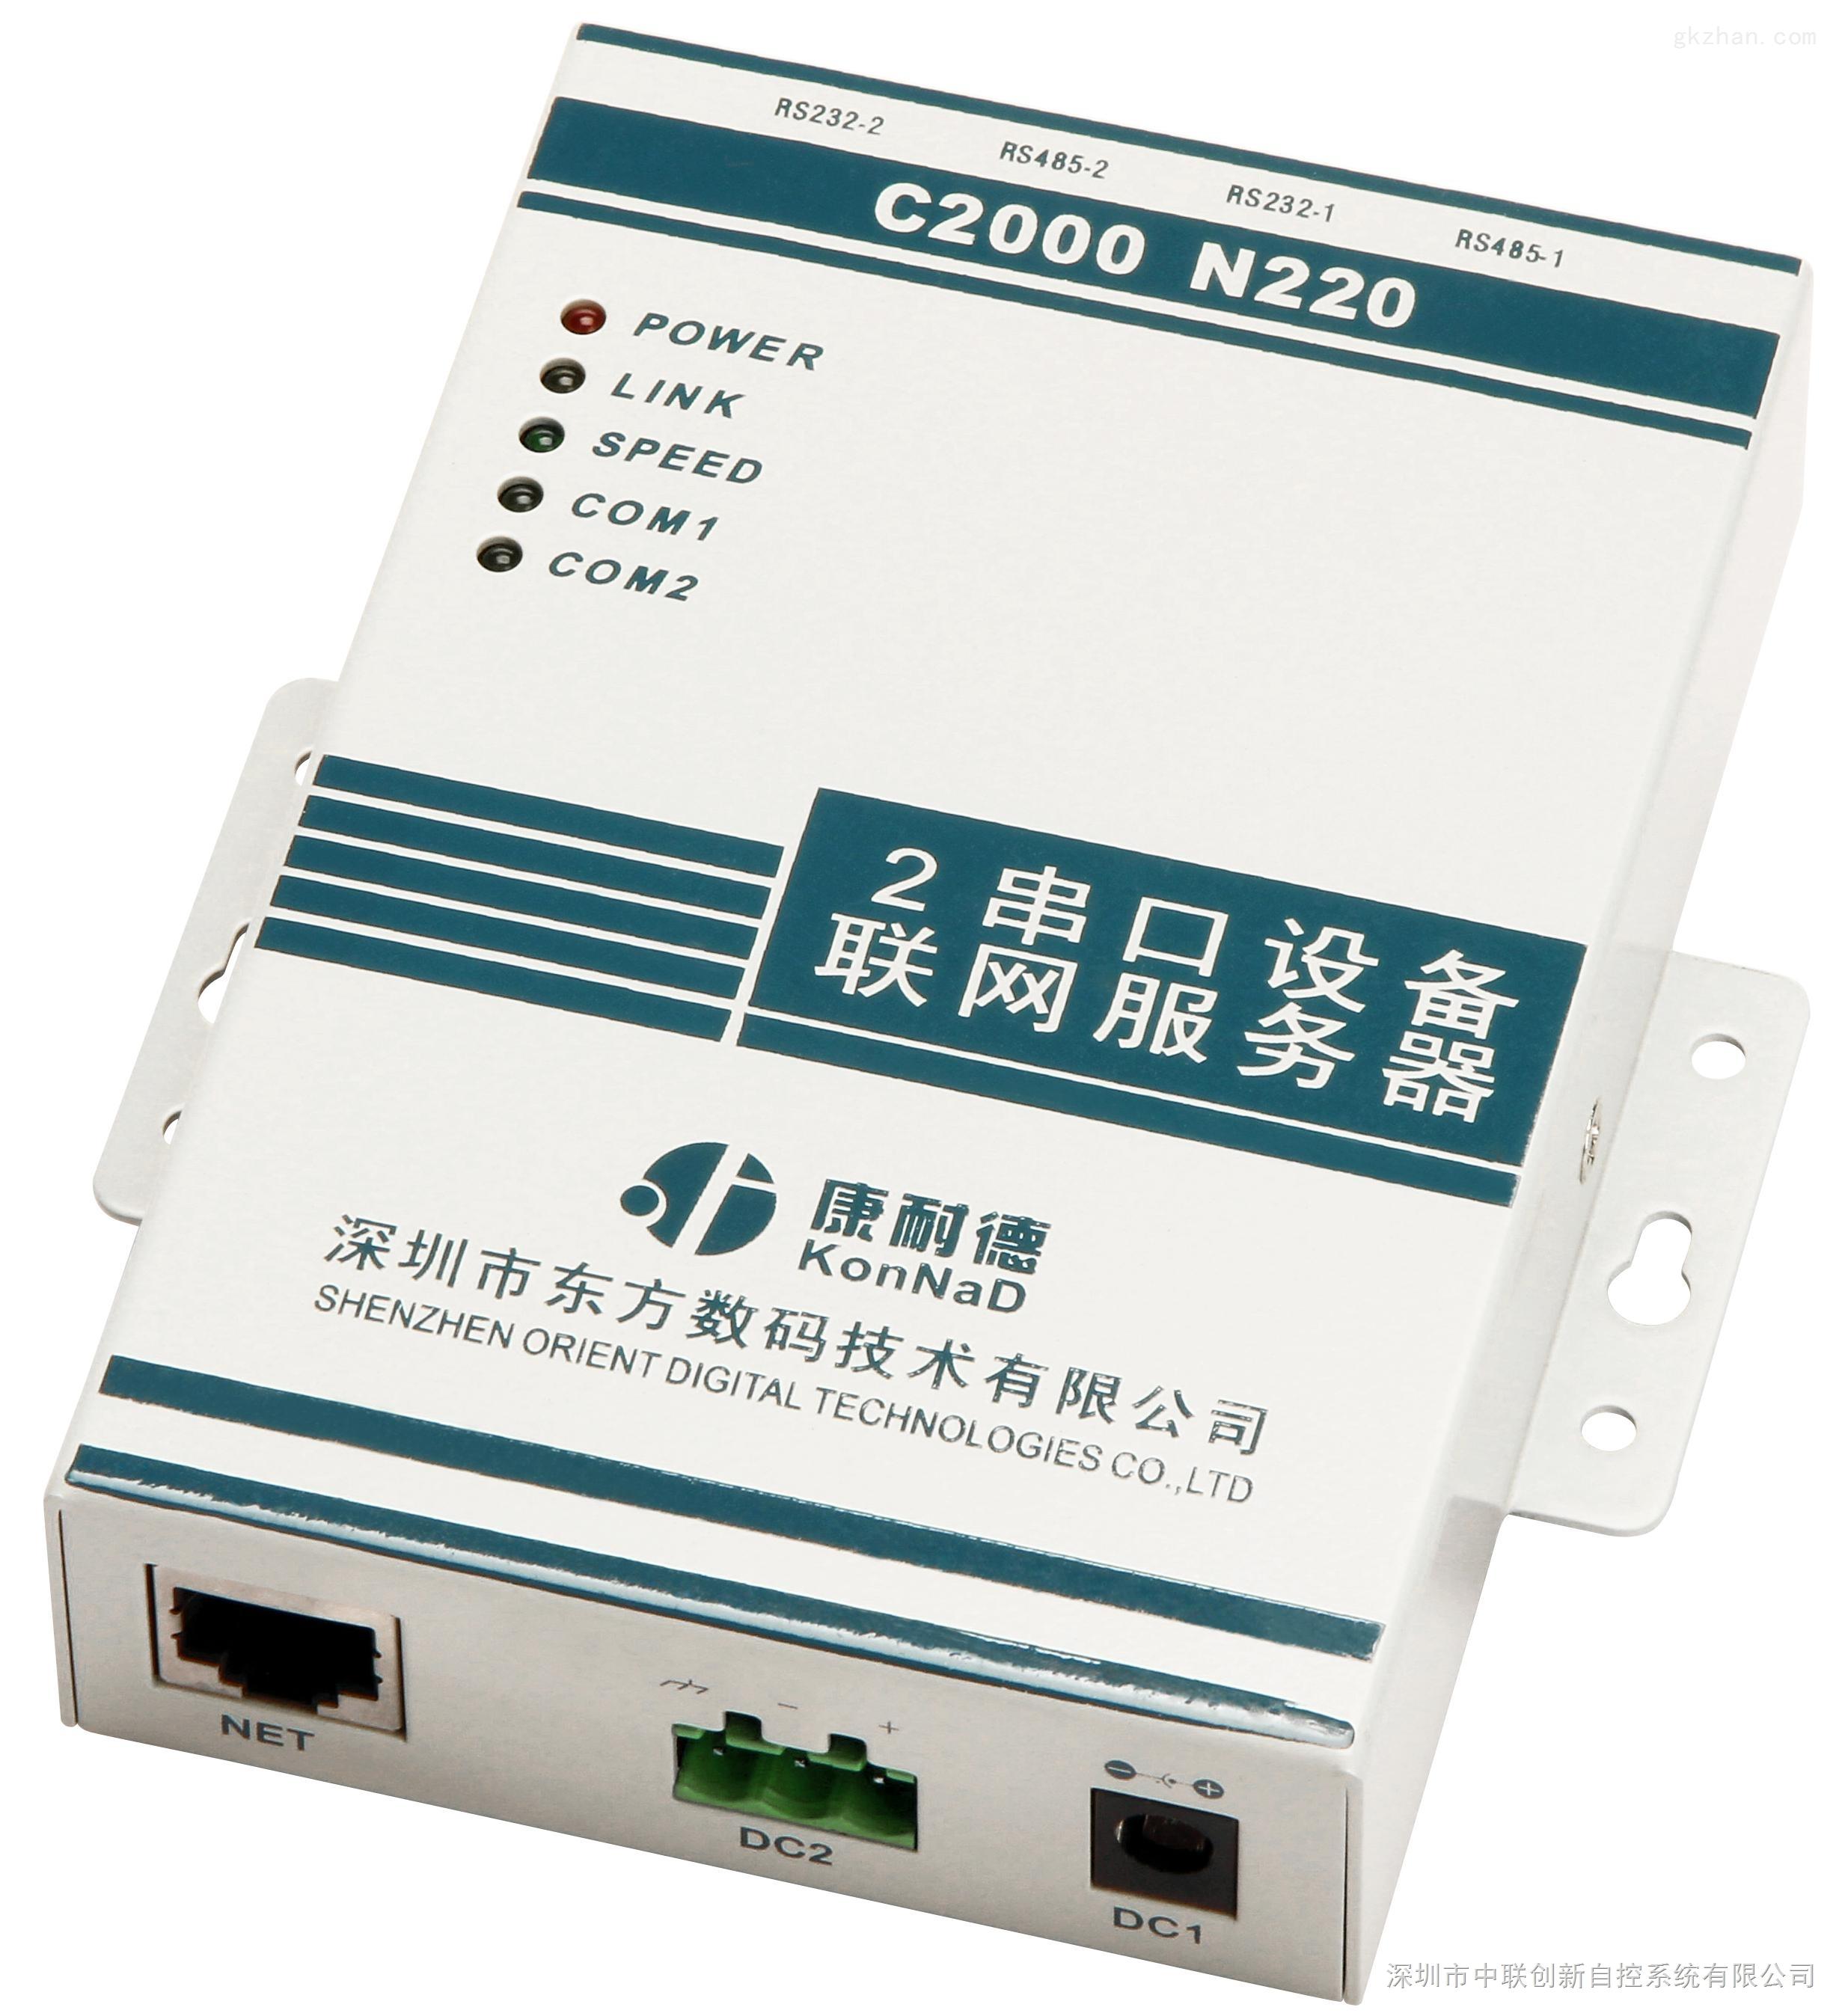 C2000 N220是一种稳定可靠的高性能工业级两串口设备联网服务器,它提供RS232/485/422到TCP/IP网络和TCP/IP网络到RS232/485/422的数据透明传输,它可以使具有RS232/485/422串口的设备立即具备联入TCP/IP网络的功能。 C2000 N220向上提供10/100M以太网接口,向下提供2个标准RS232//485/422串行口,通讯参数可通过多种方式设置。C2000 N220可广泛应用于PLC控制与管理、门禁医疗、楼宇控制、工业自动化、测量仪表及环境动力监控系统